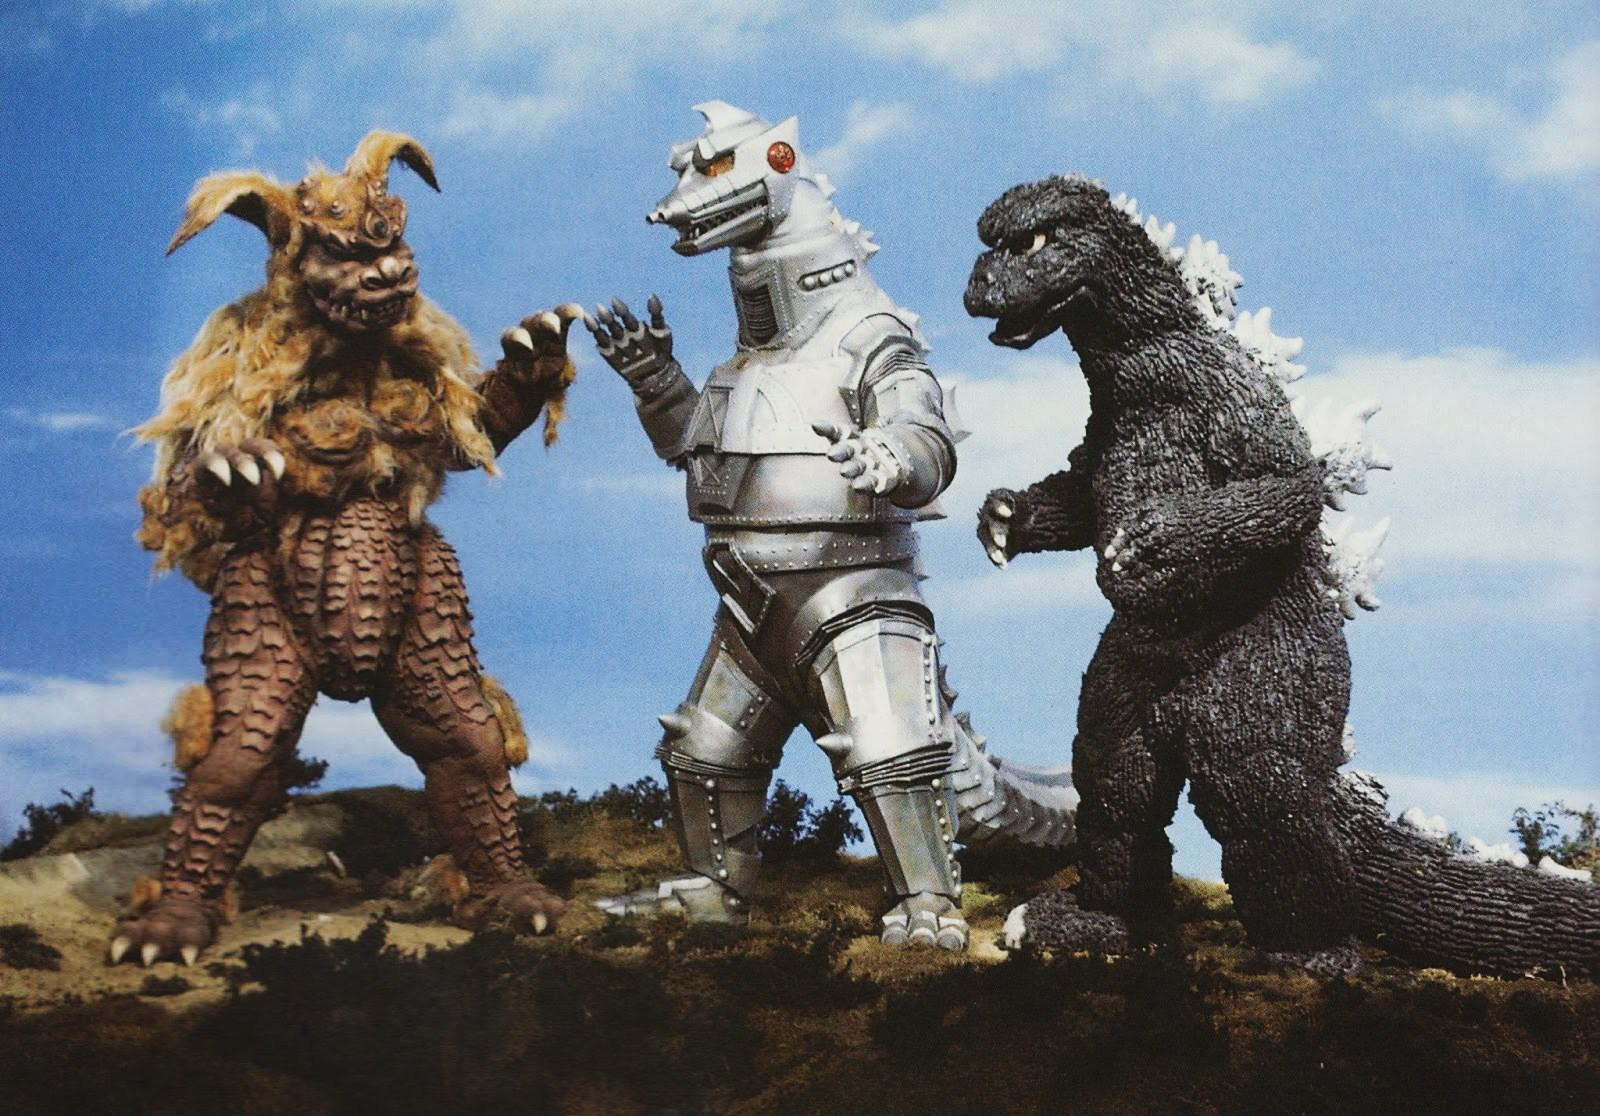 Godzilla - Sci-fi